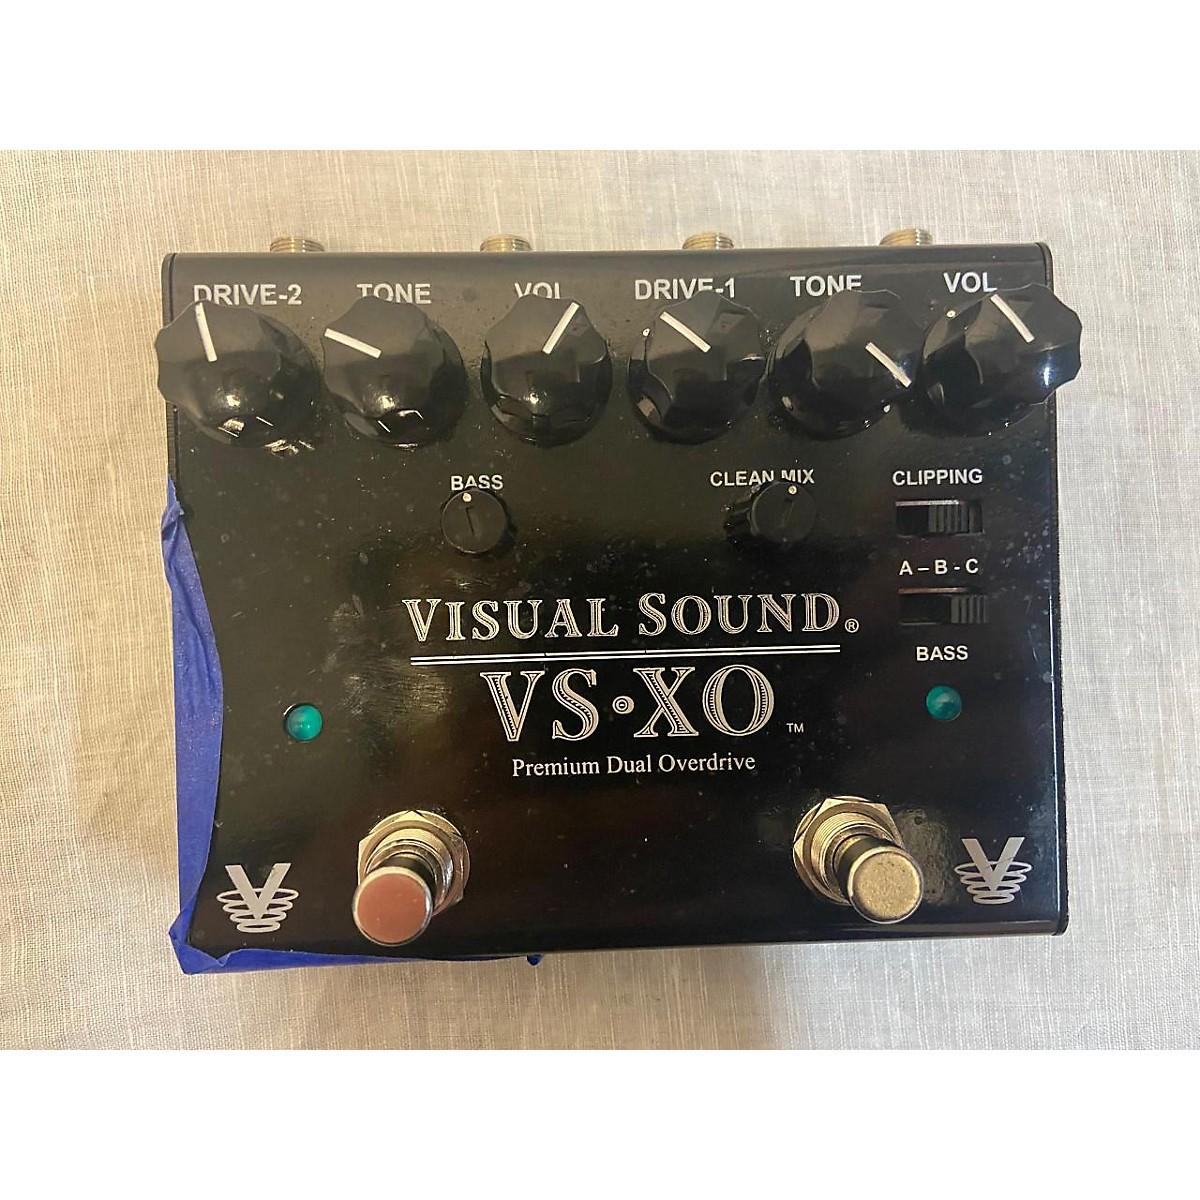 Visual Sound VSXO PREMIUM DUAL OVERDRIVE Effect Pedal